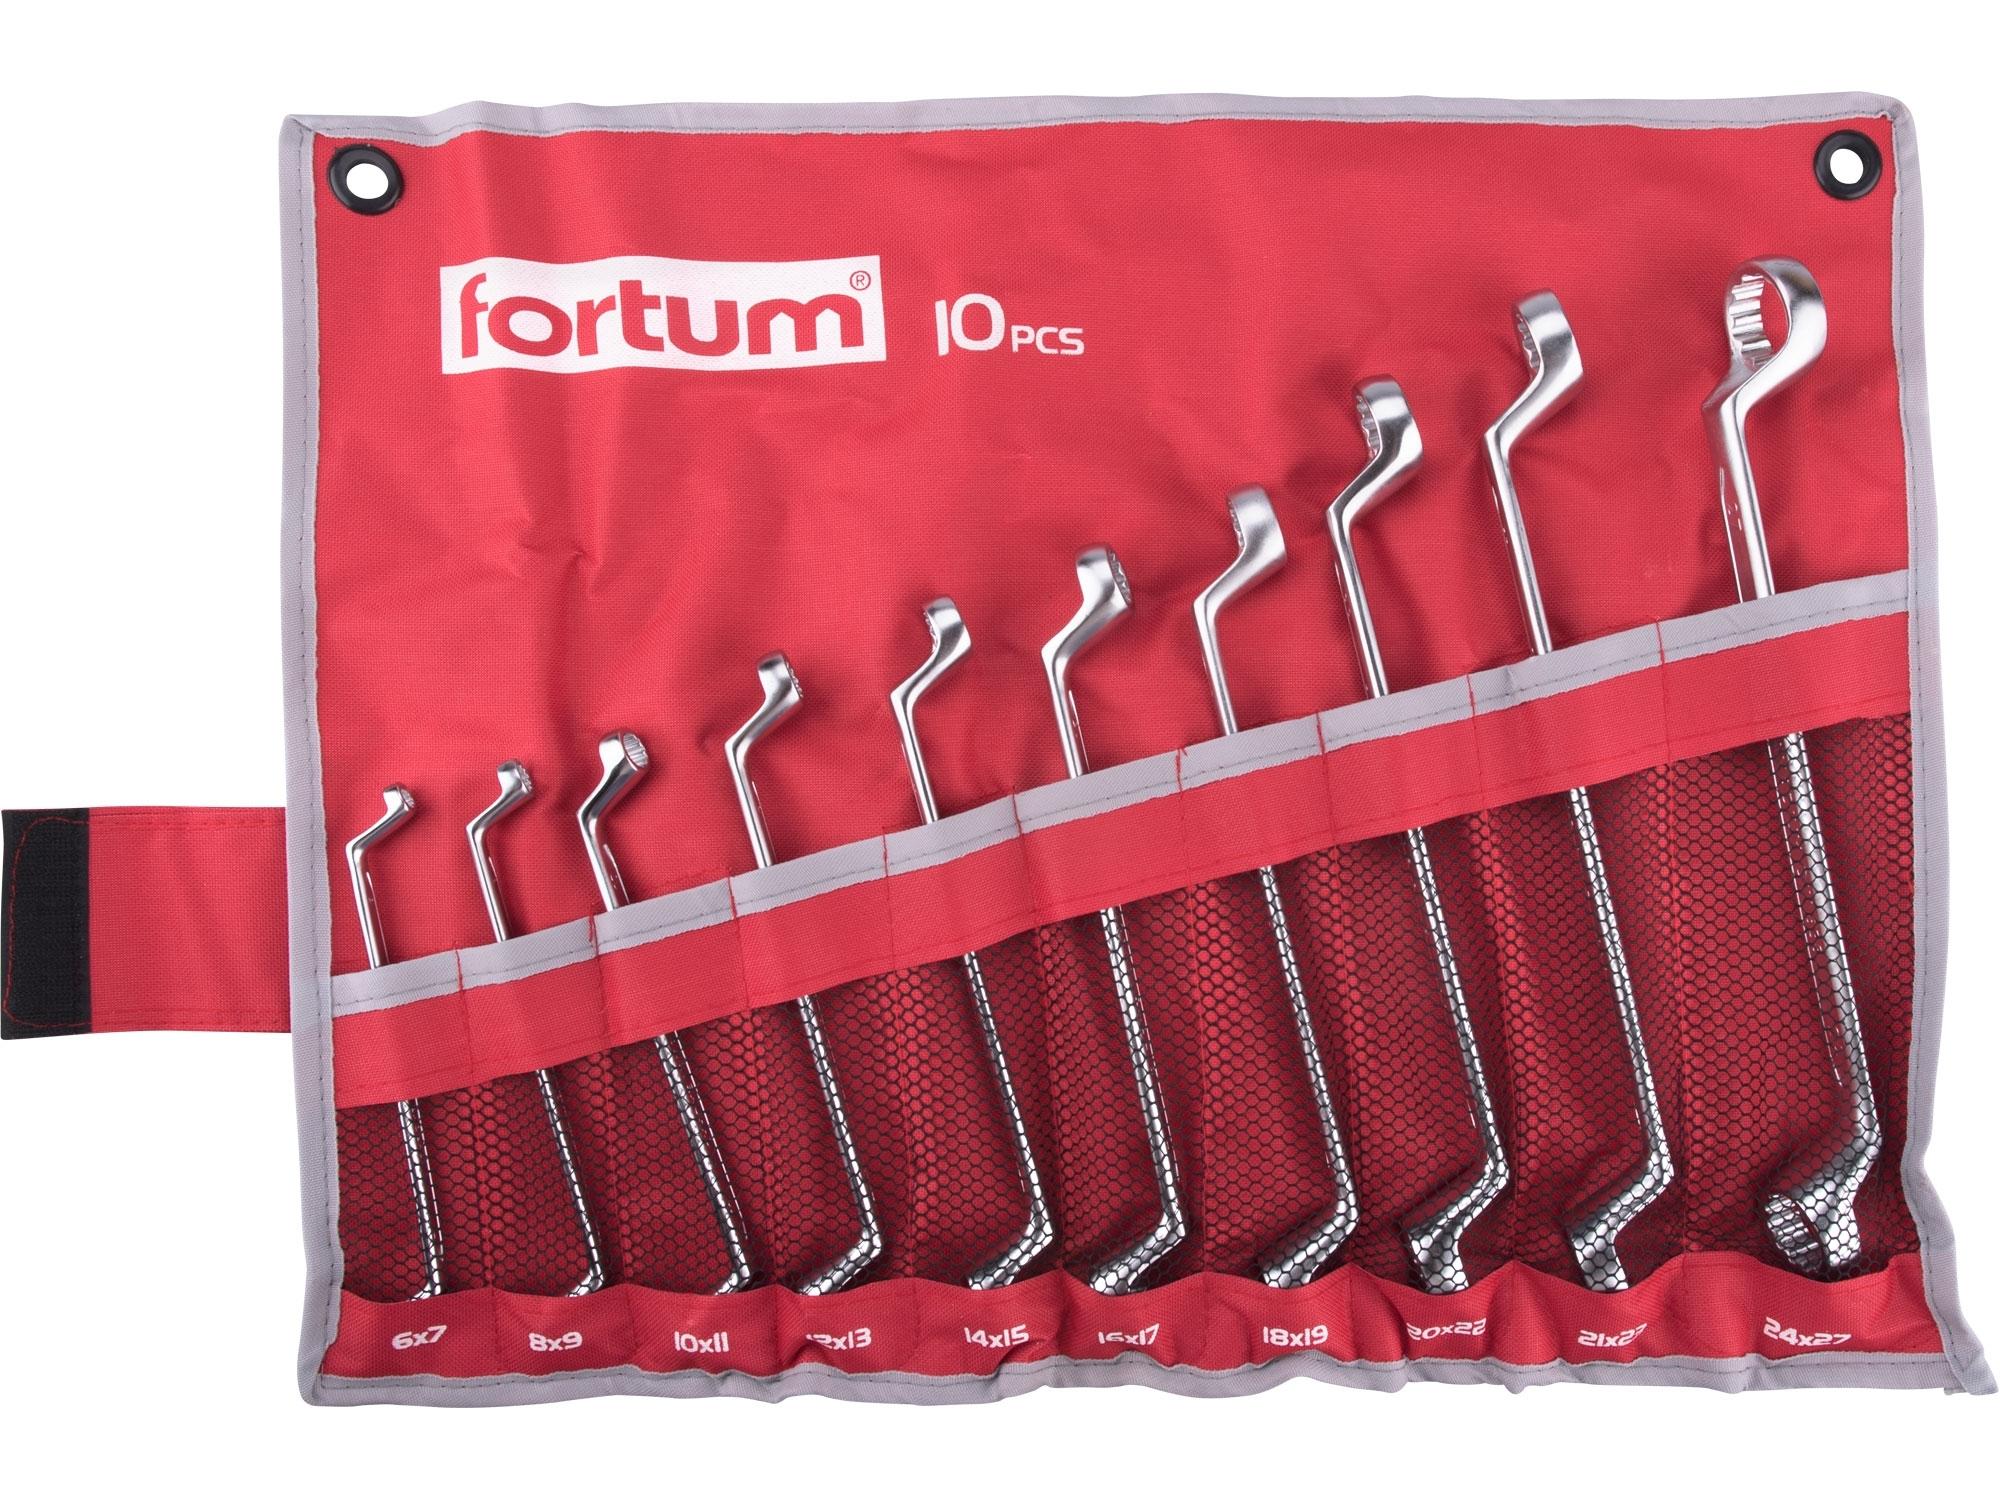 klíče očkové, sada 10ks, 6-27mm, FORTUM 4730301